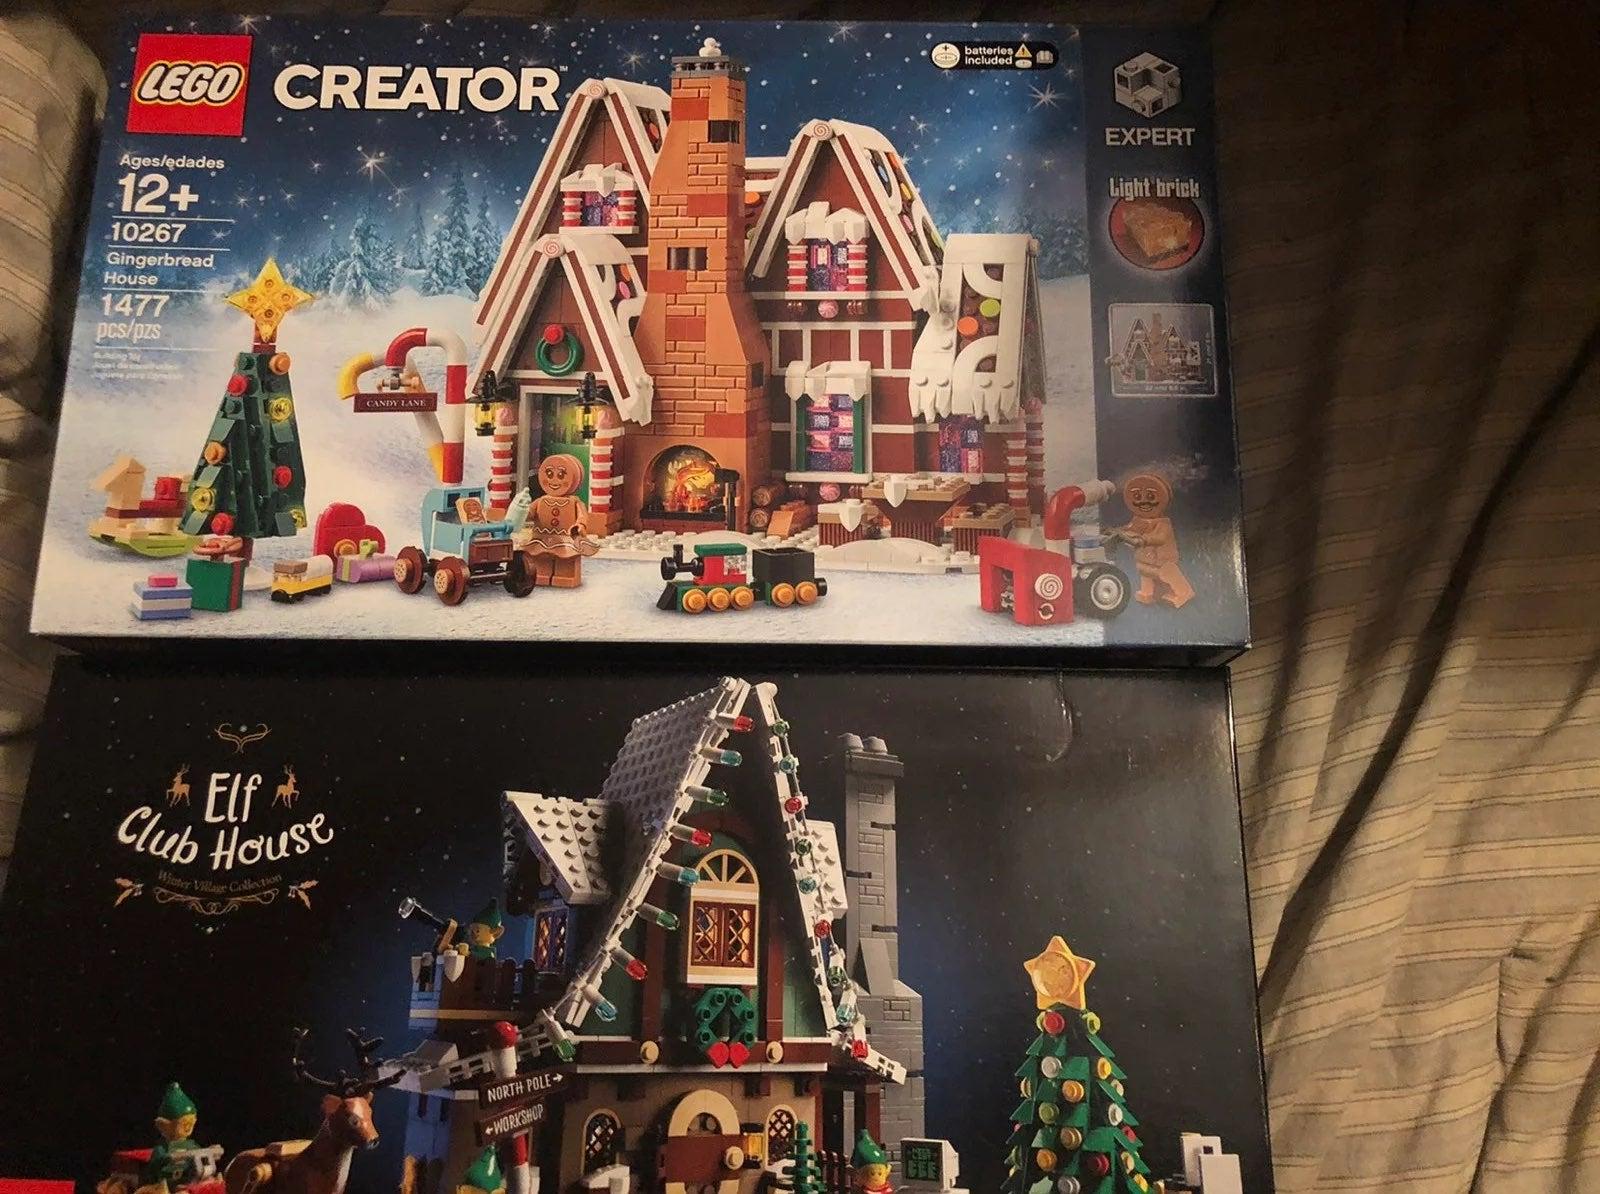 Lego 10267 & lego 10275 Gingerbread & El